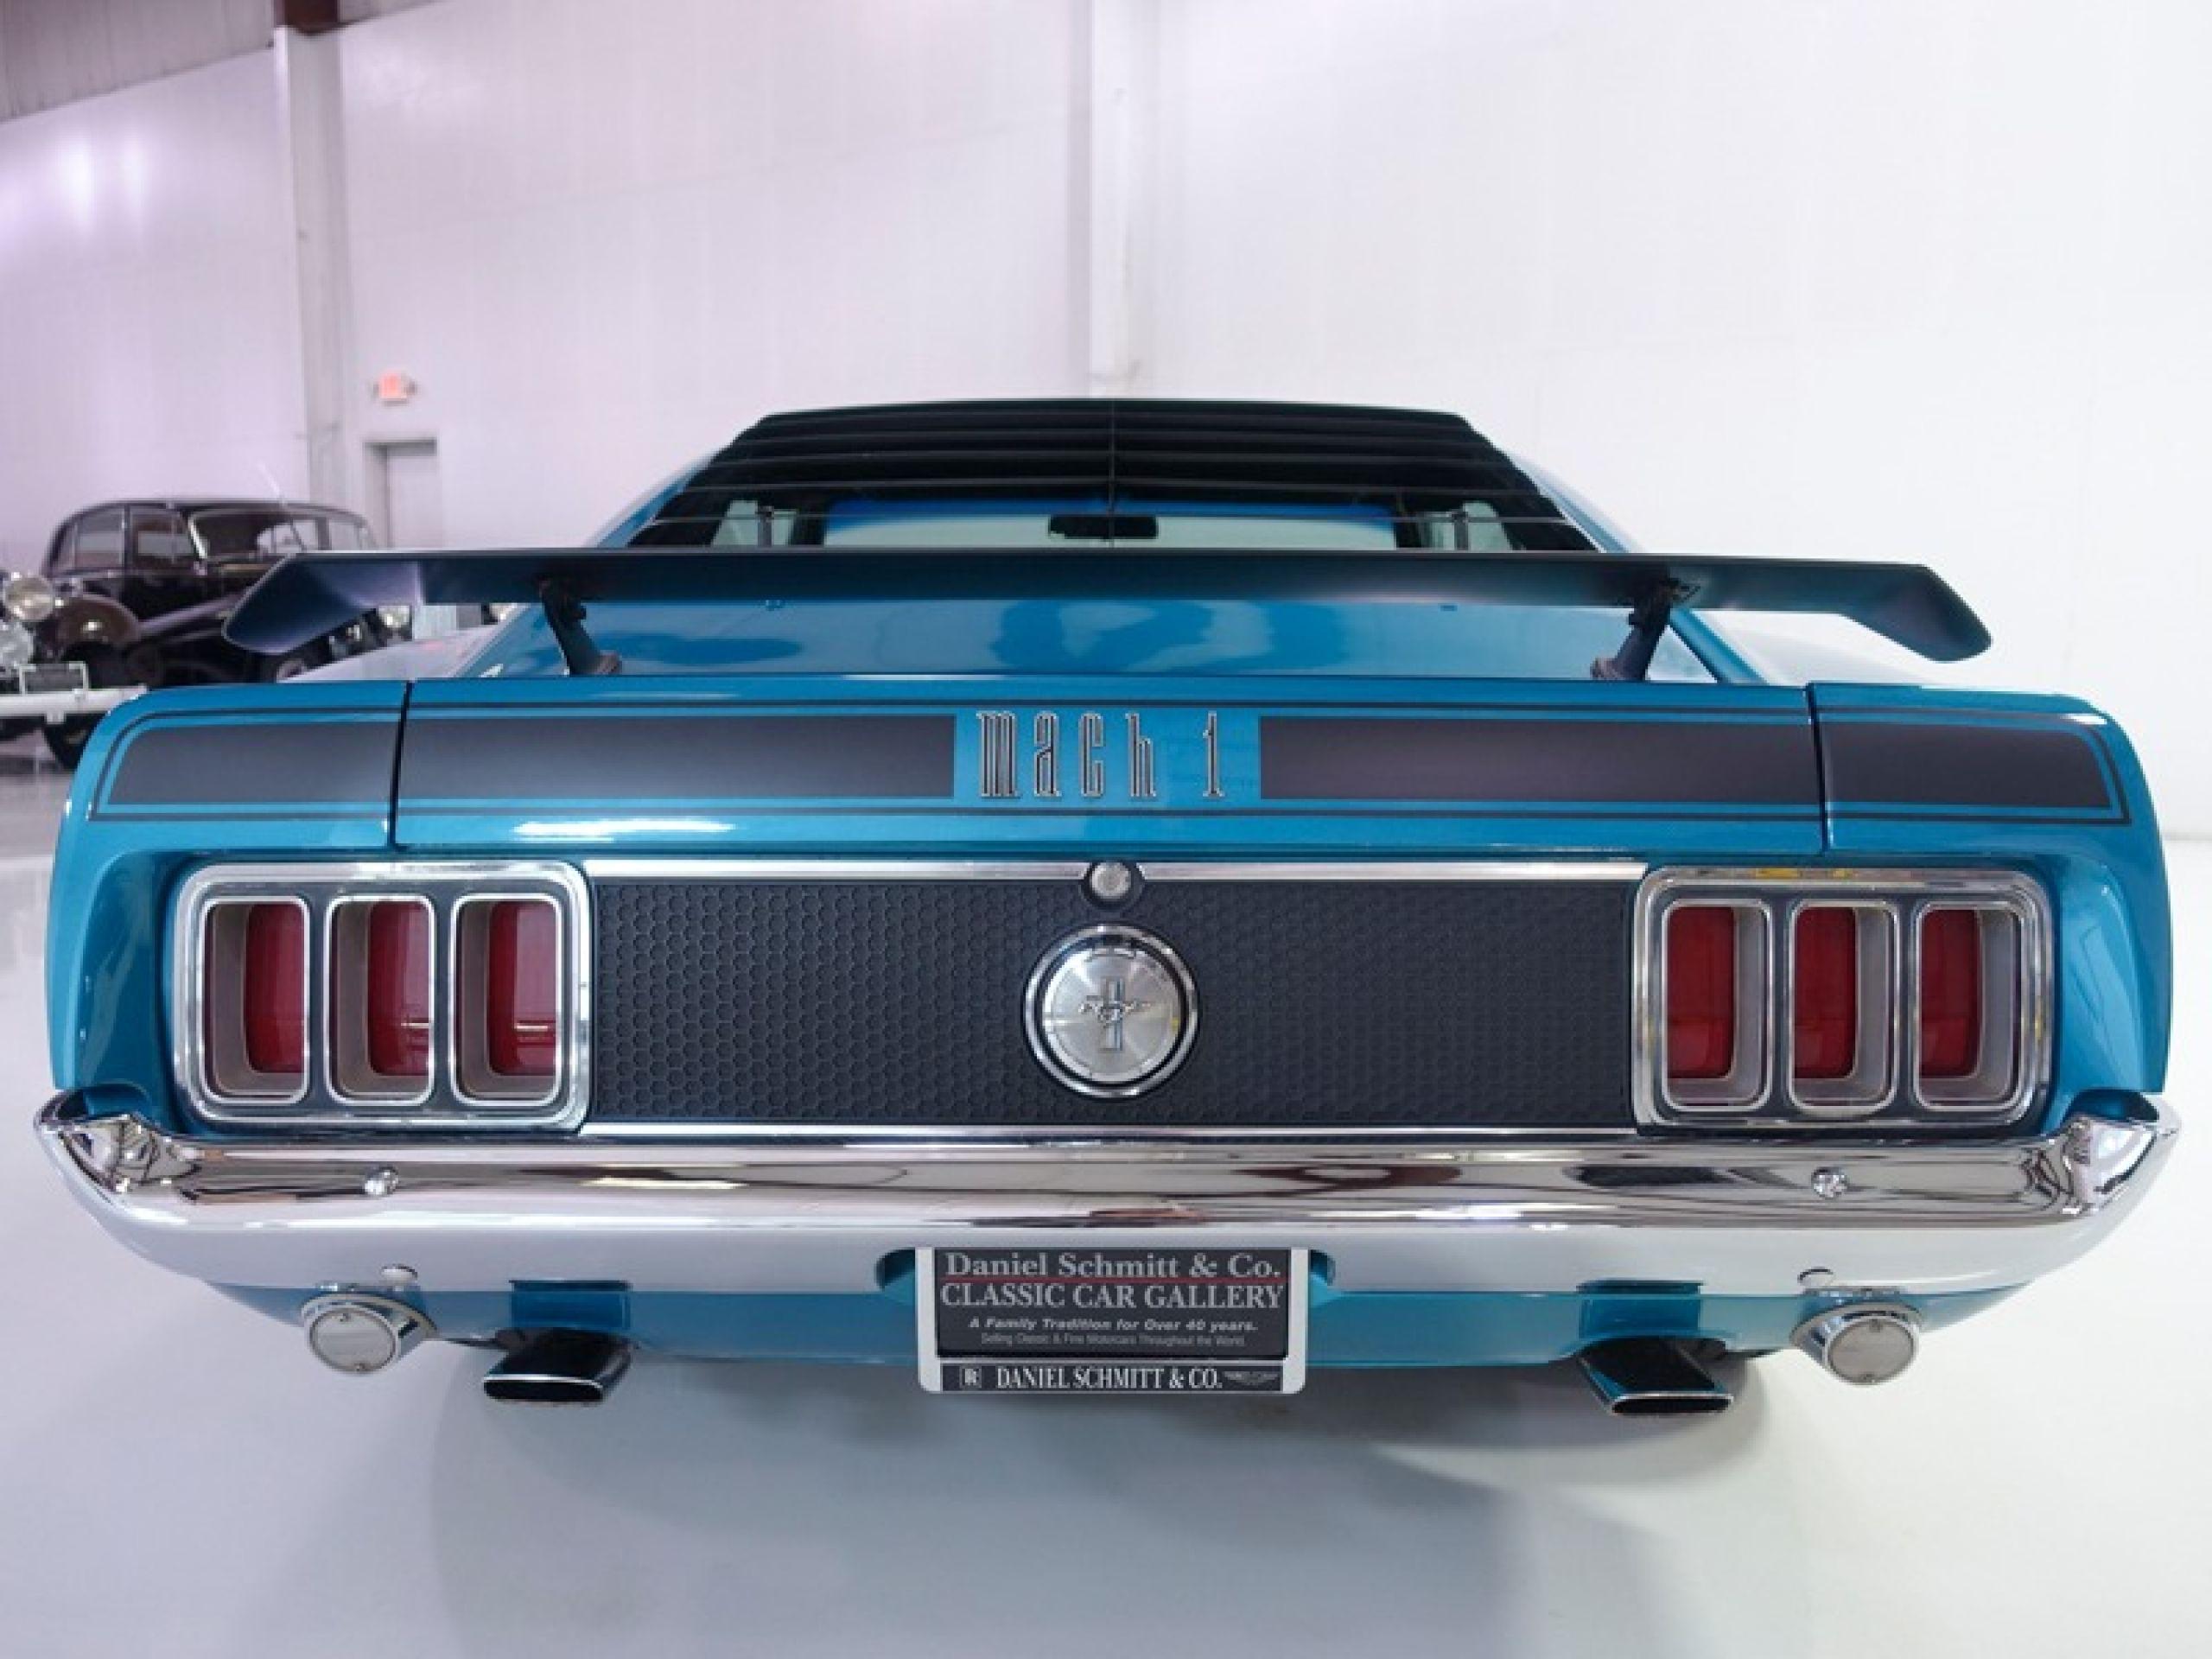 1970 Ford Mustang Mach 1 428 Super Cobra Jet Sportsroof